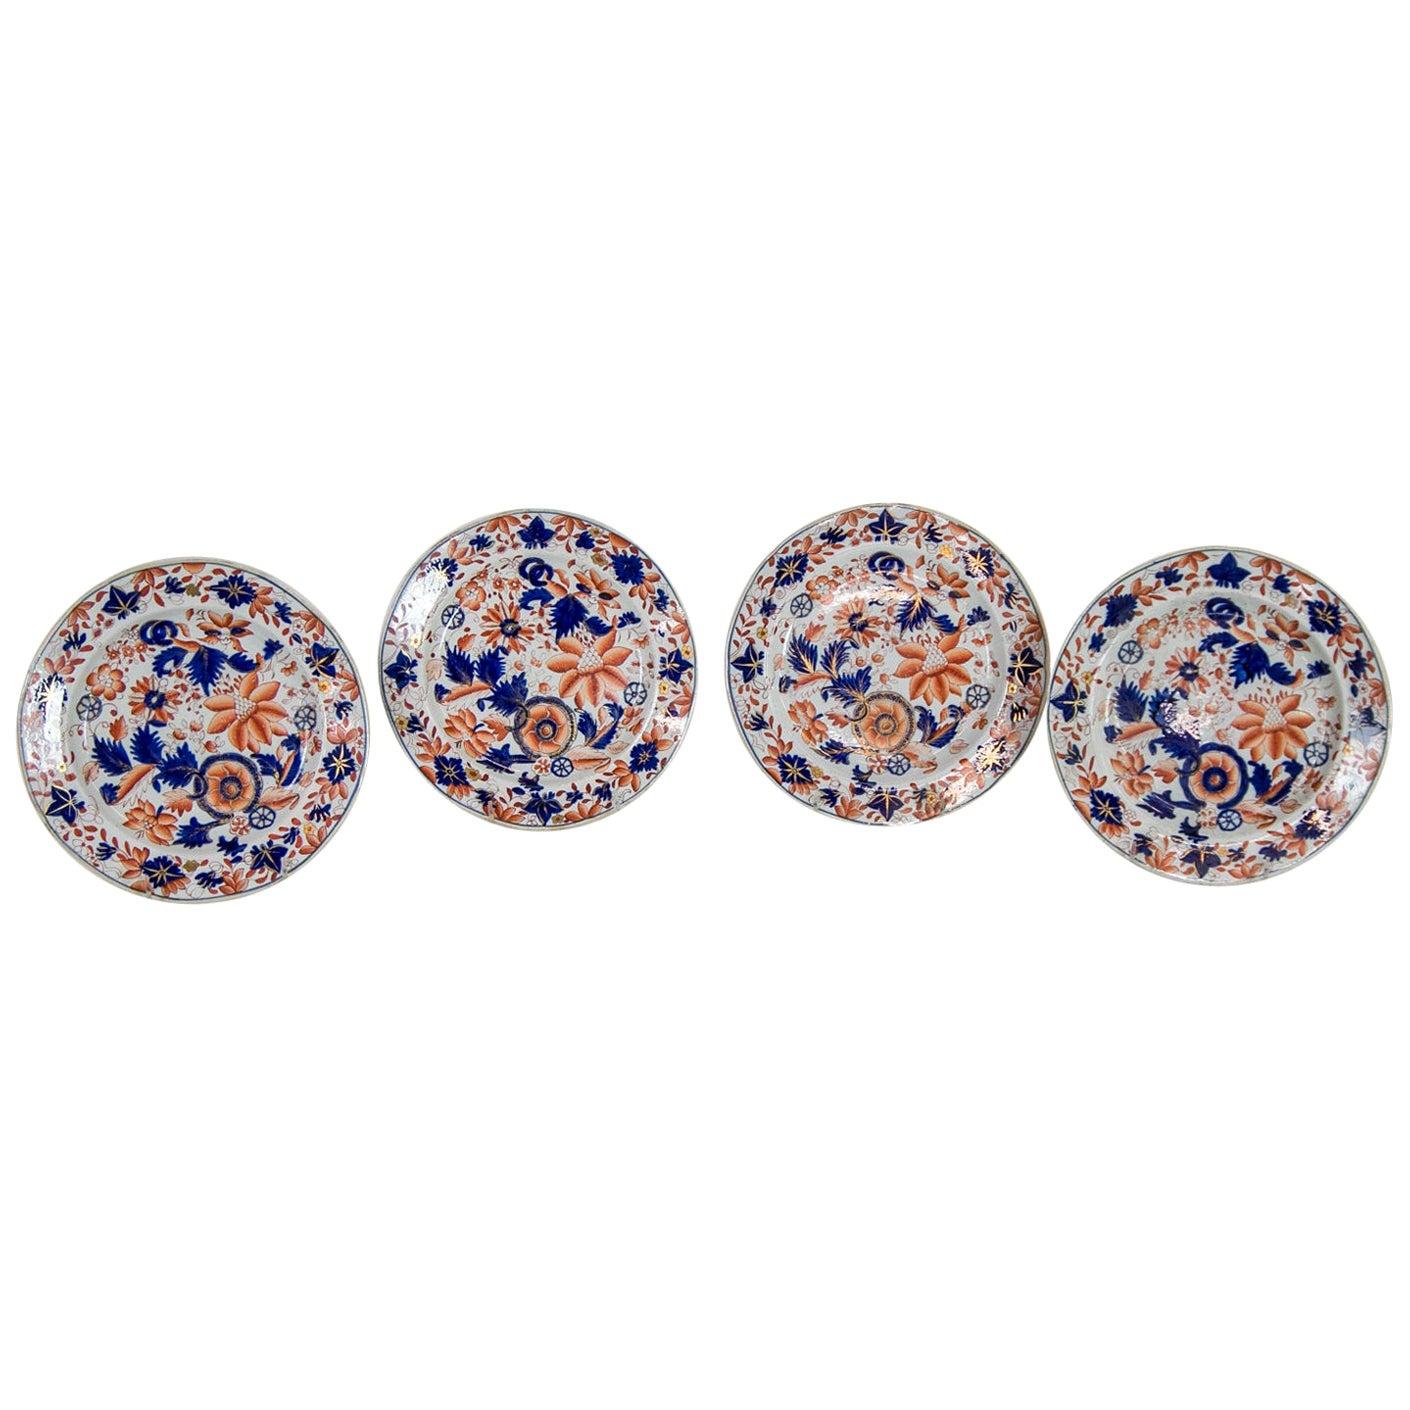 Set of Four English Ironstone Plates